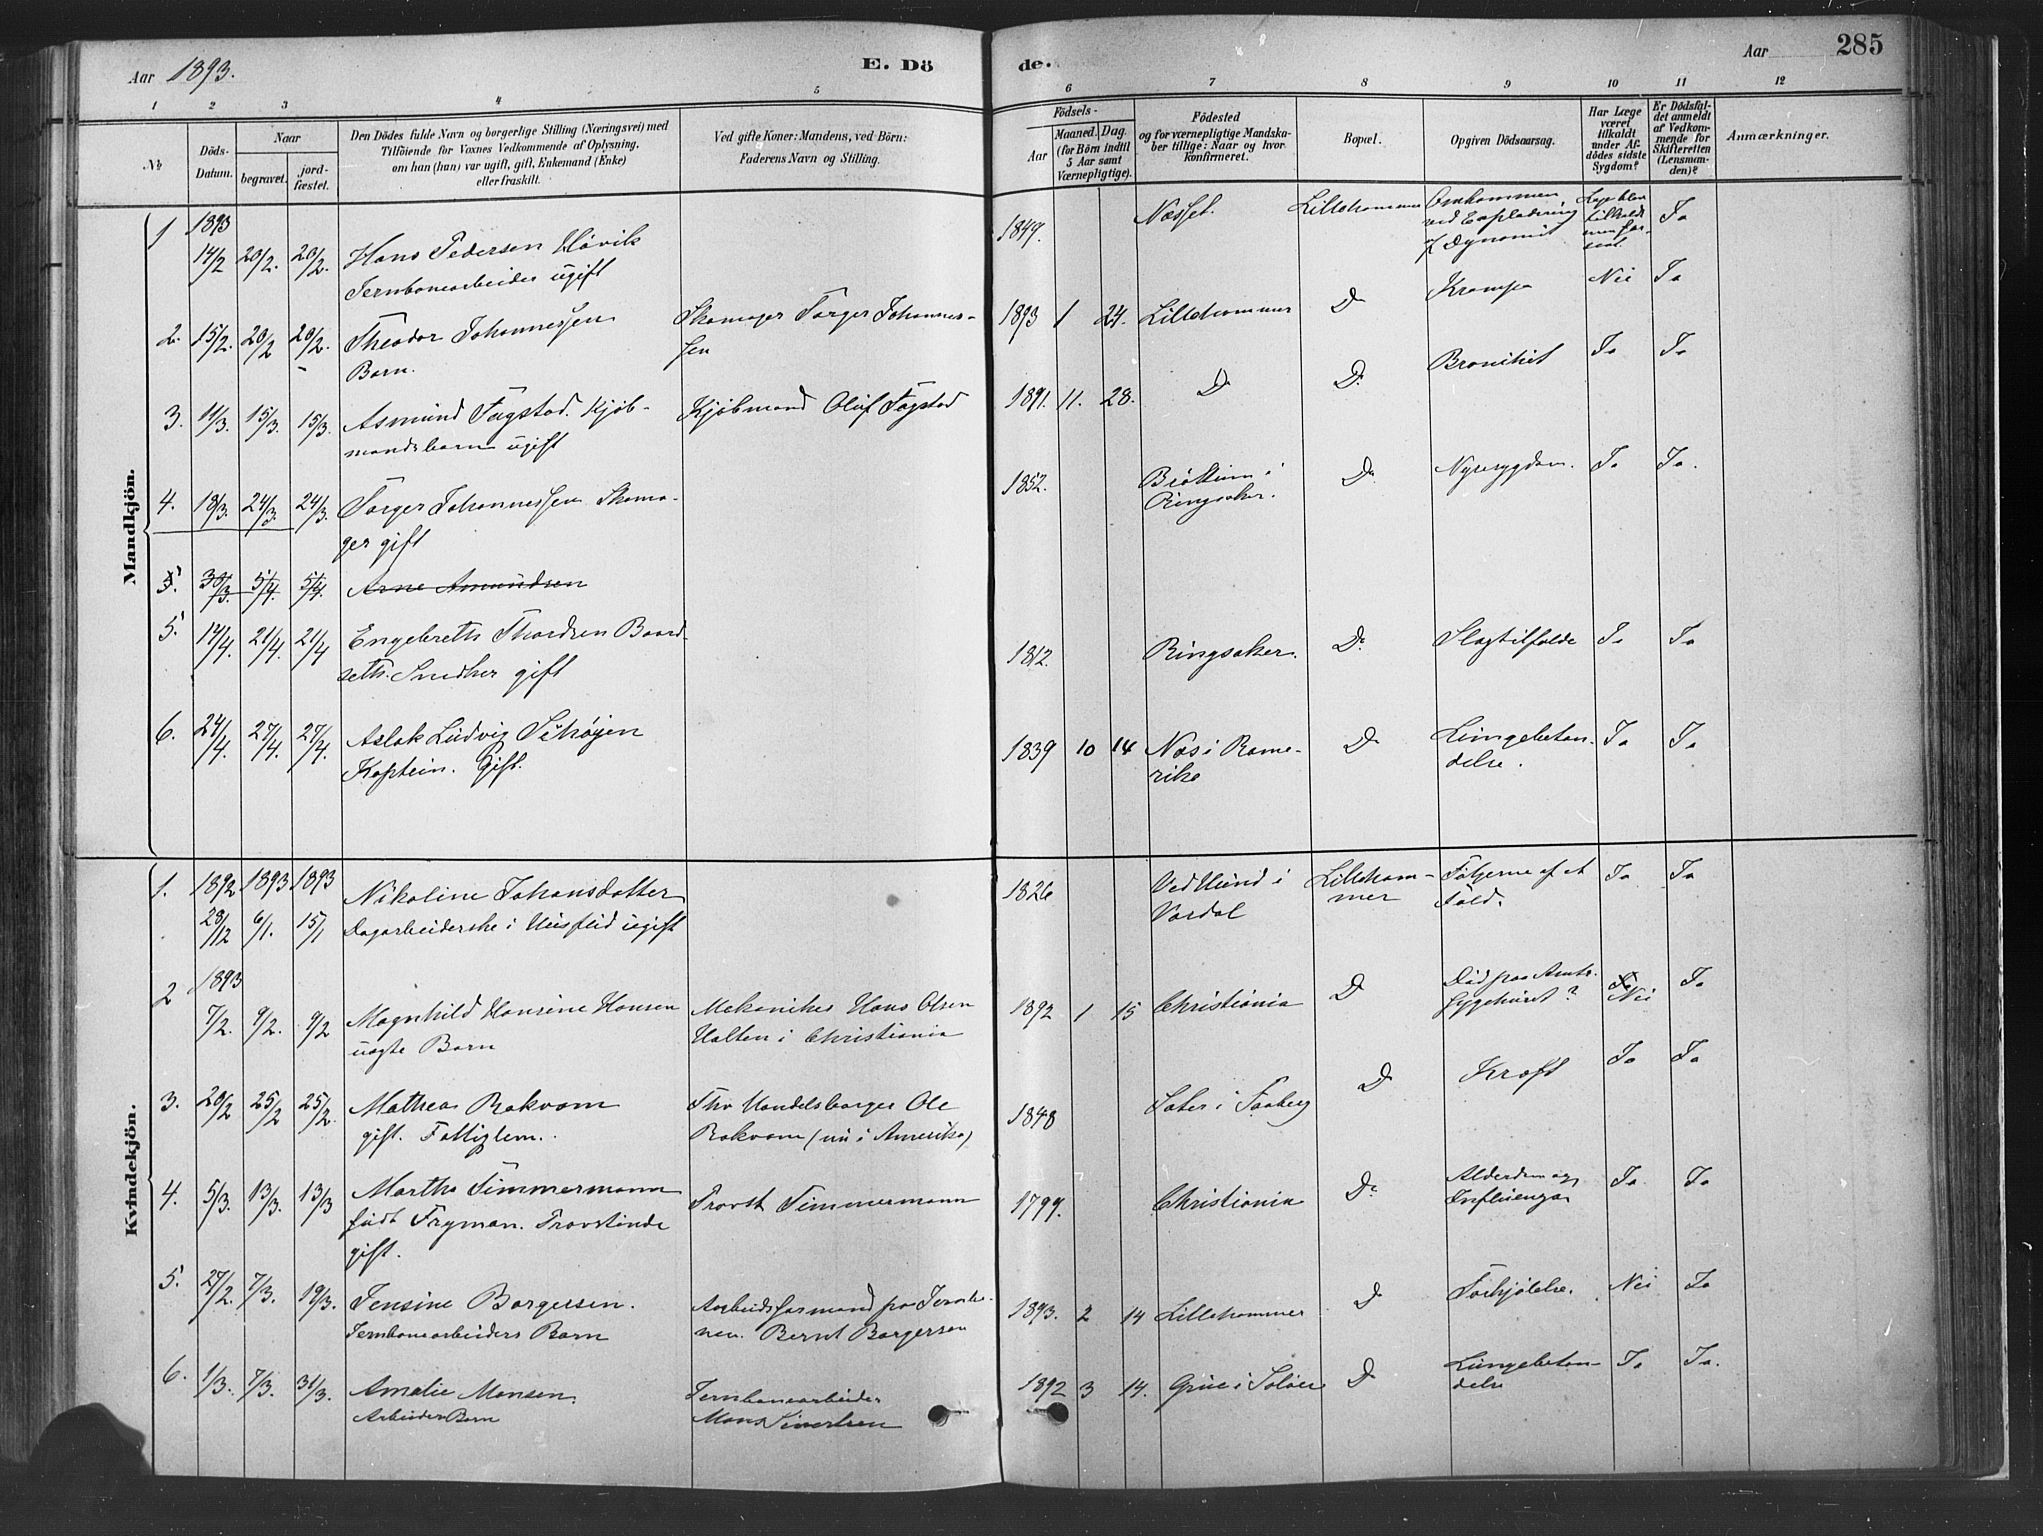 SAH, Fåberg prestekontor, Ministerialbok nr. 10, 1879-1900, s. 285